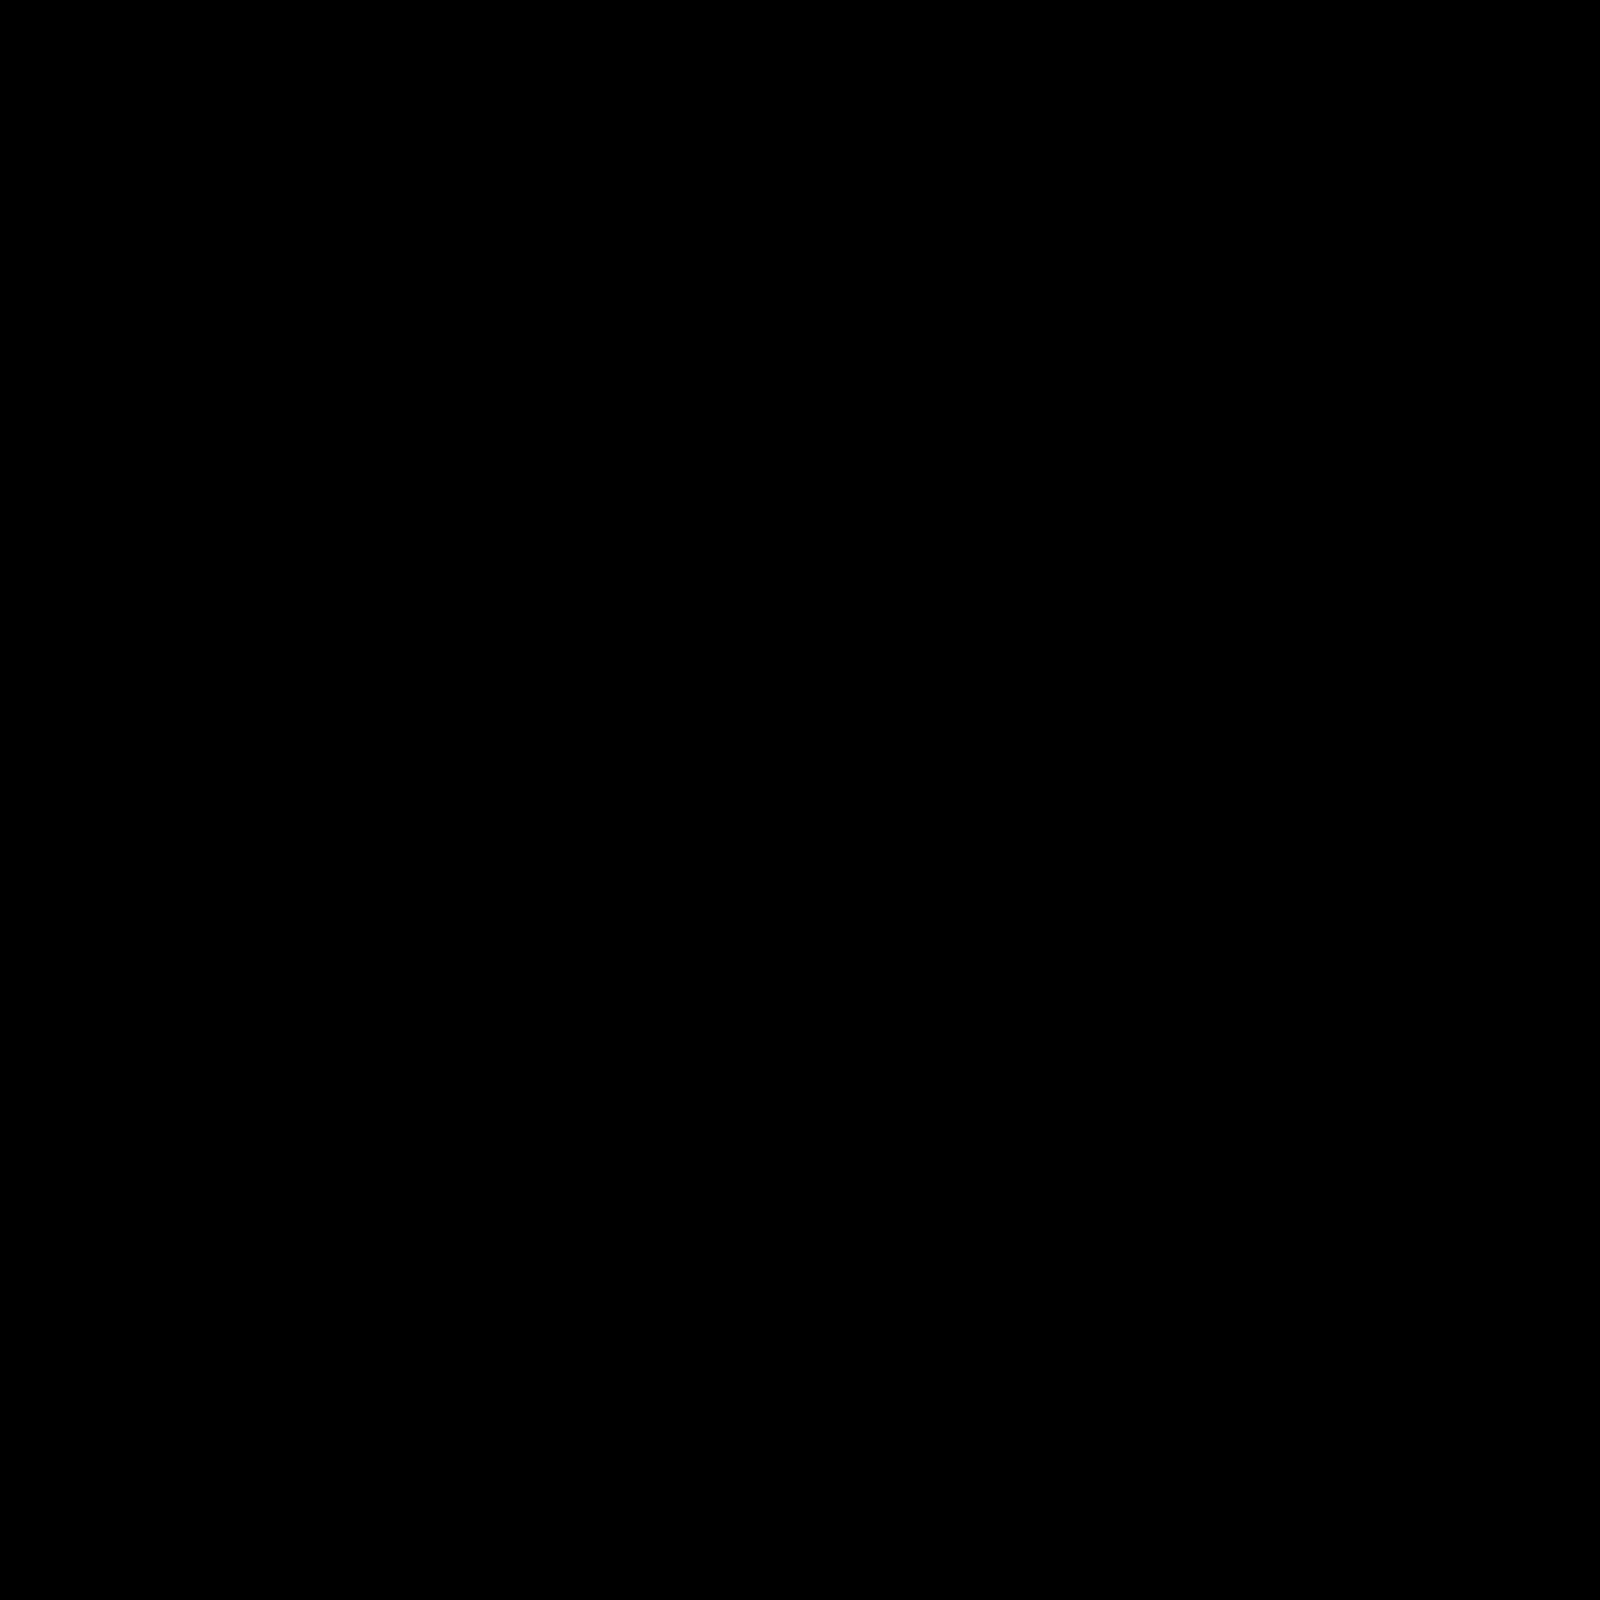 Padlock Outline icon